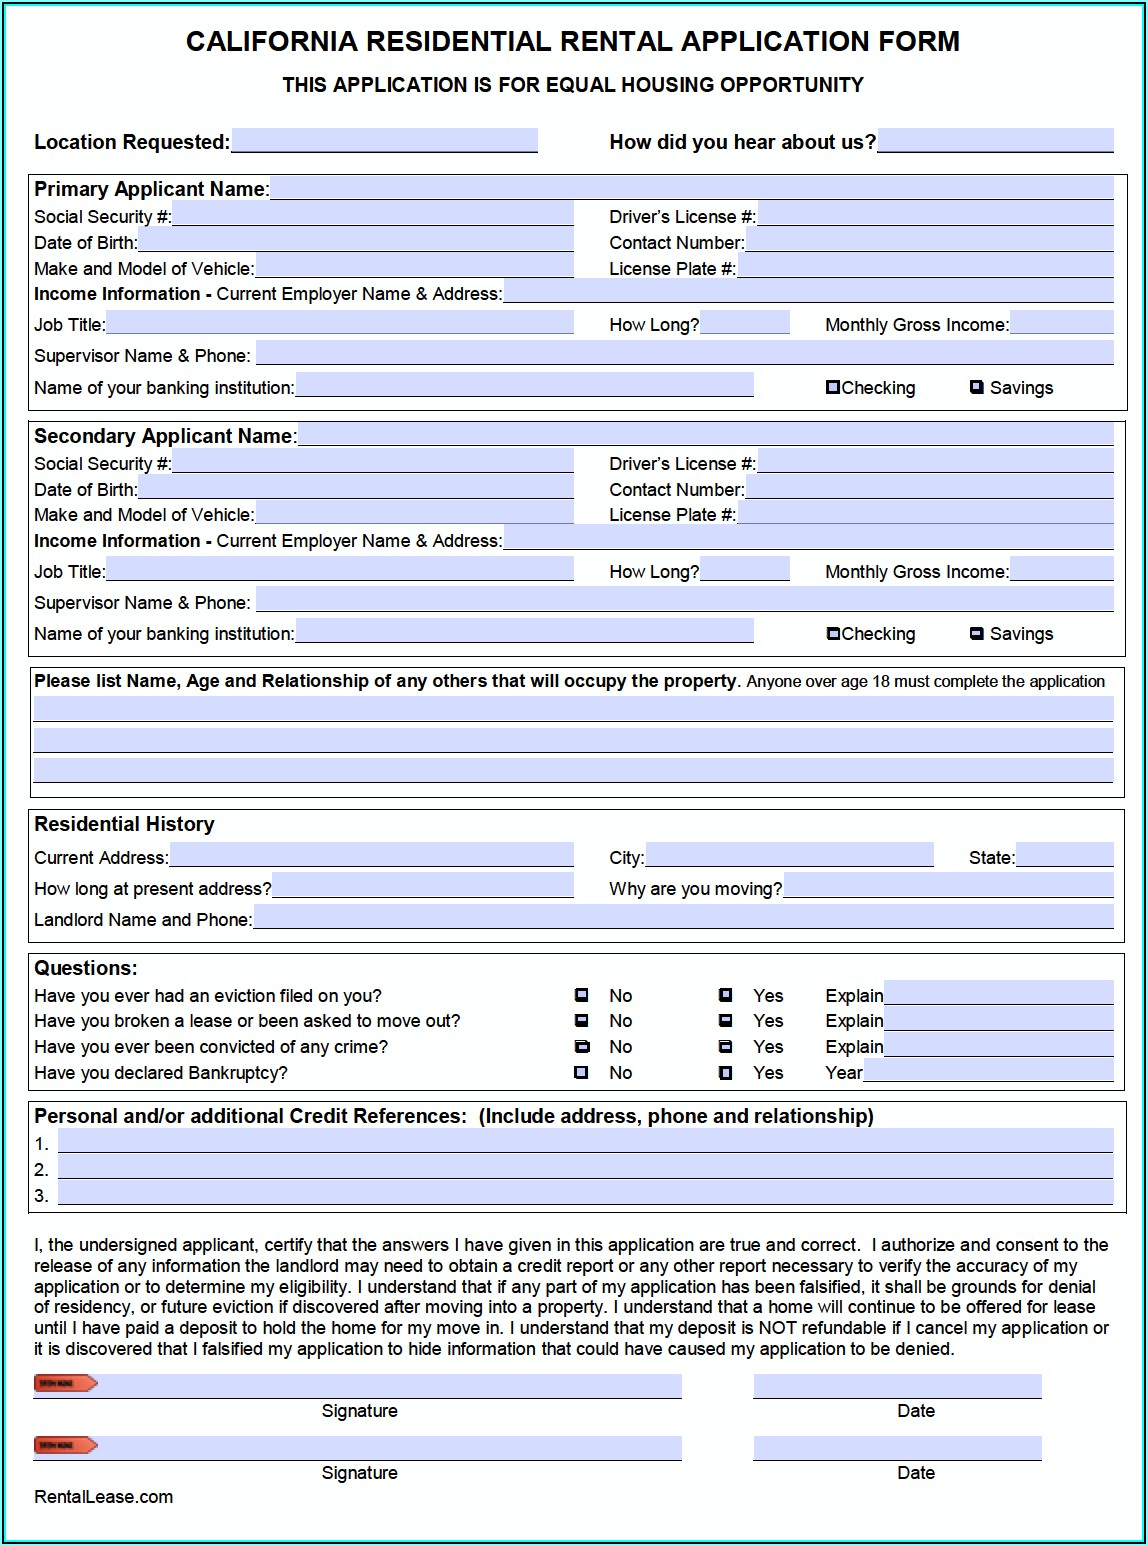 California Rental Application Form Pdf Free